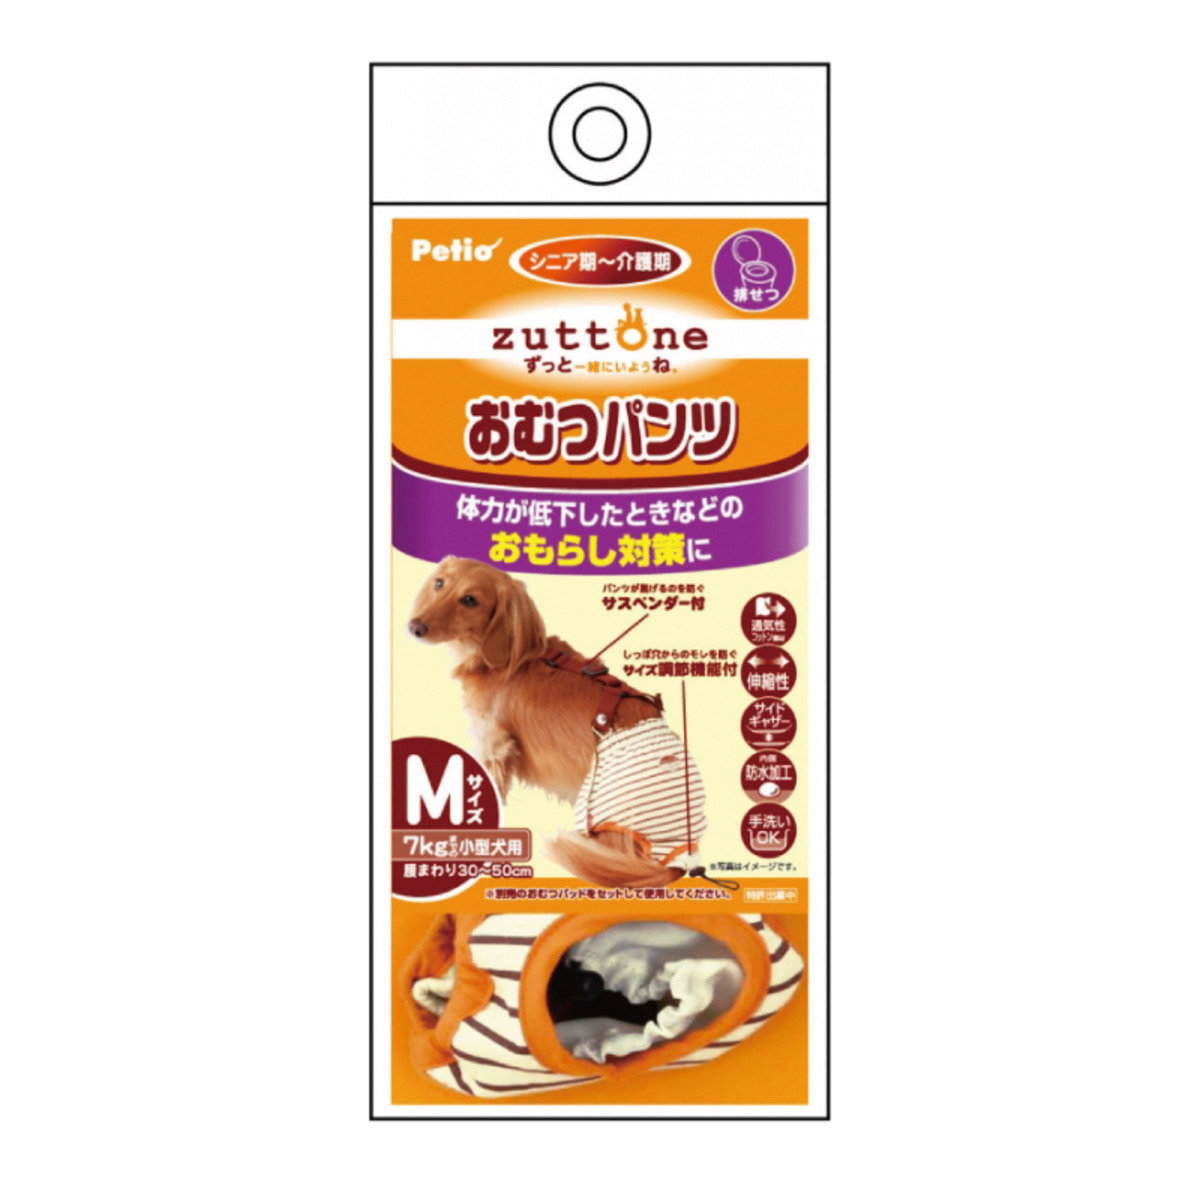 zuttone高齡犬護理出街專用尿褲 M (W23633)